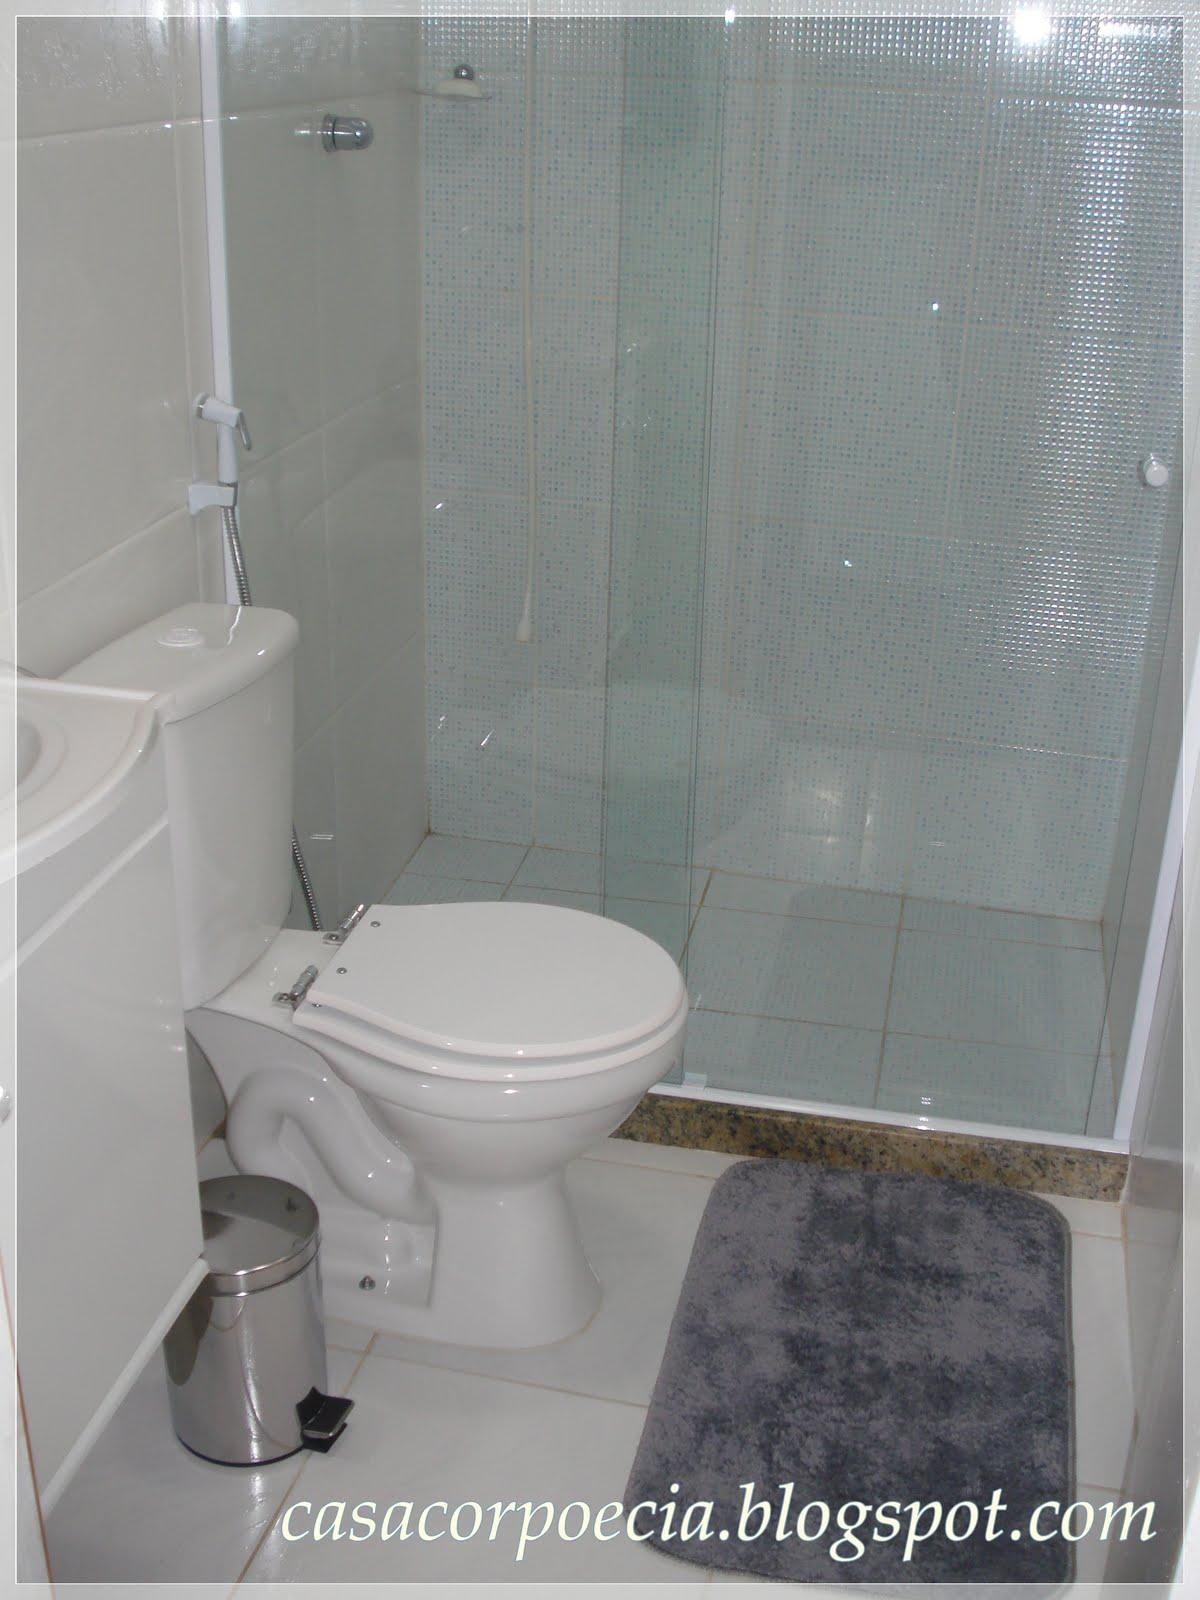 Meu banheiro  Casa Corpo e Cia -> Meu Banheiro Moderno